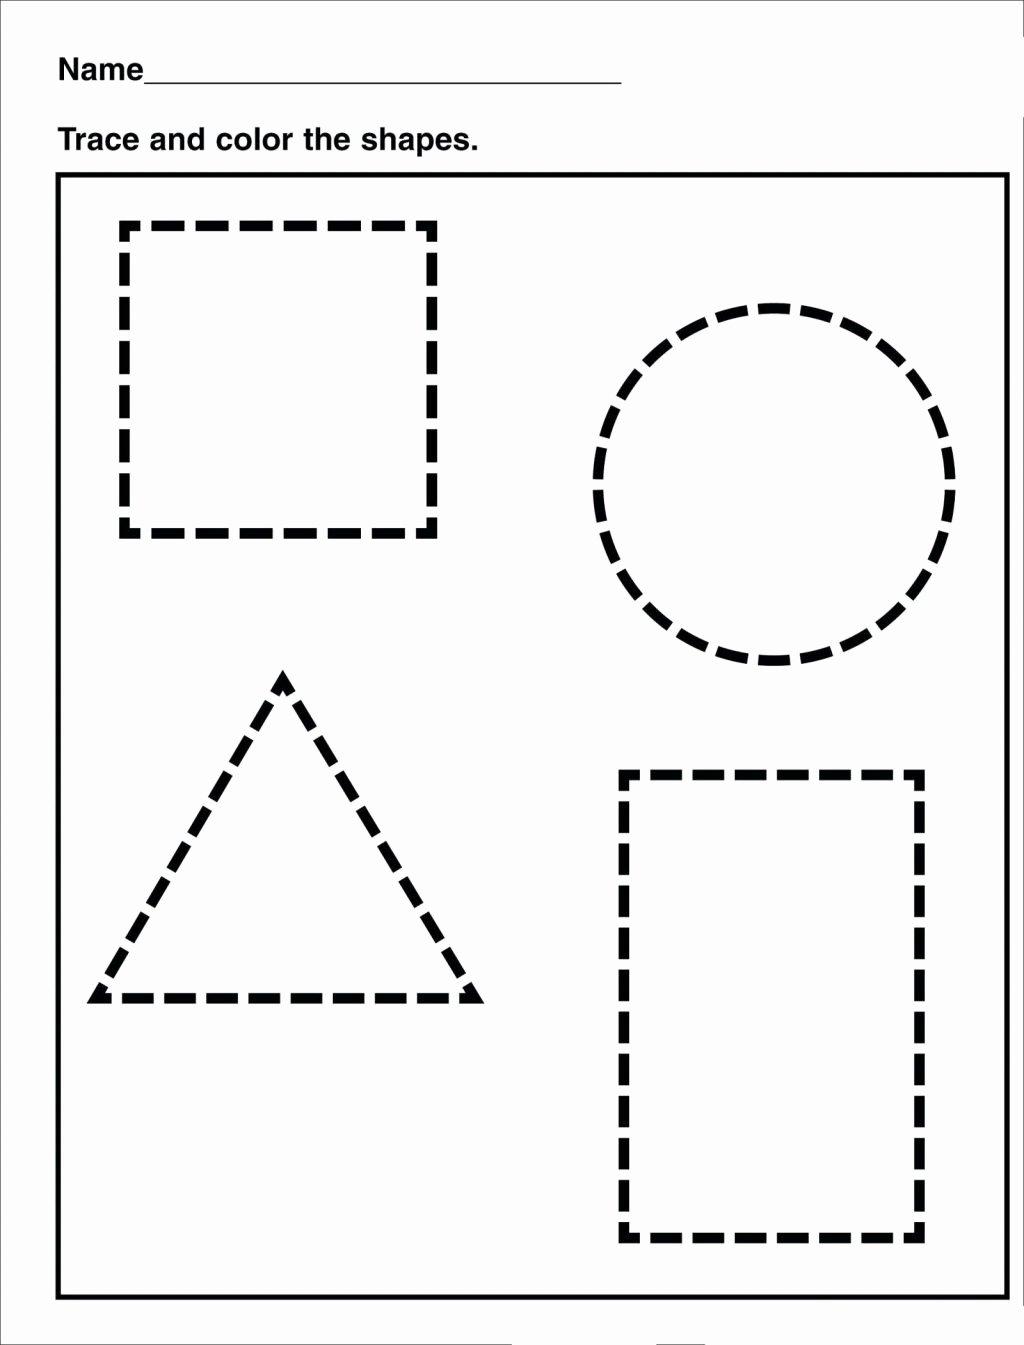 Traceable Shapes Worksheets for Preschoolers Beautiful Worksheet Tracing Shapes Worksheetsor Preschoolers